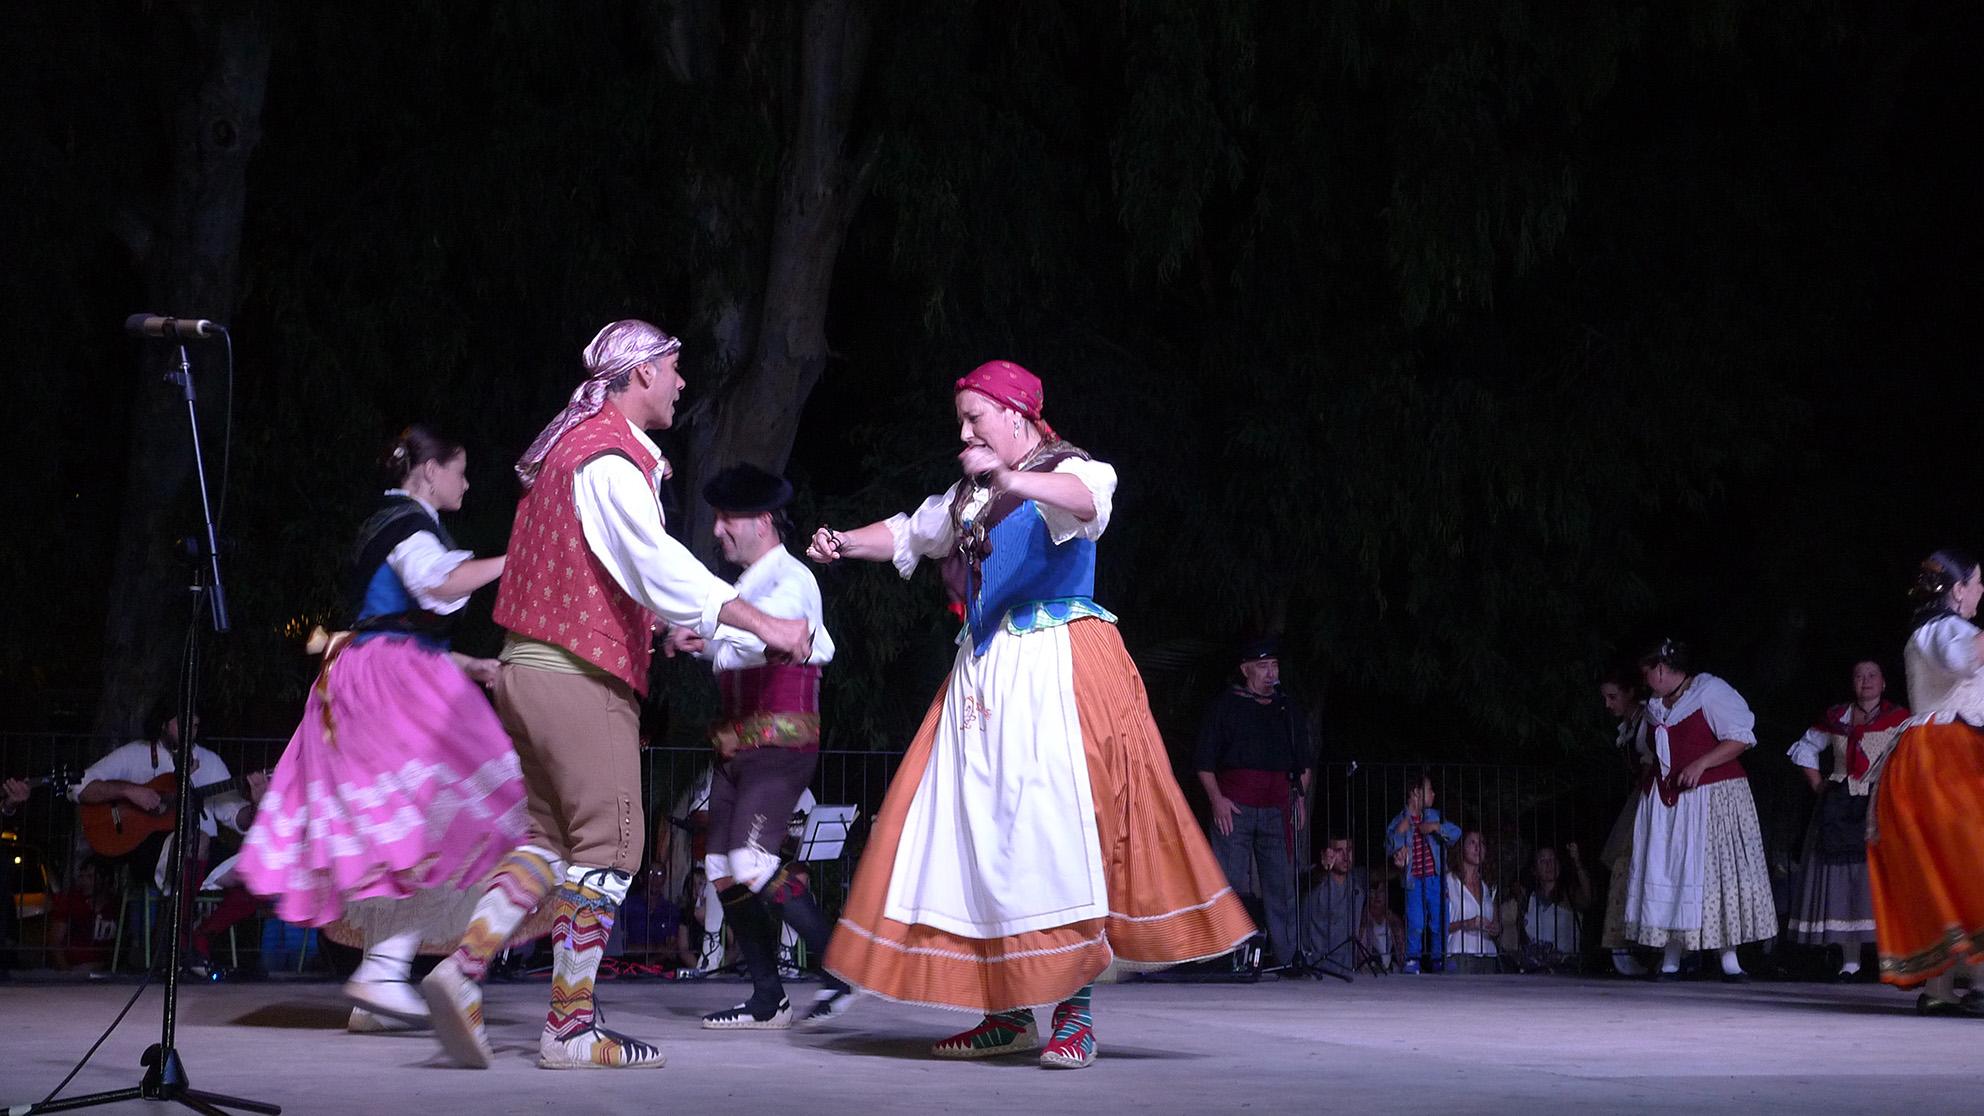 2014-10-09 Baladre a Sagunt-Cam (42)